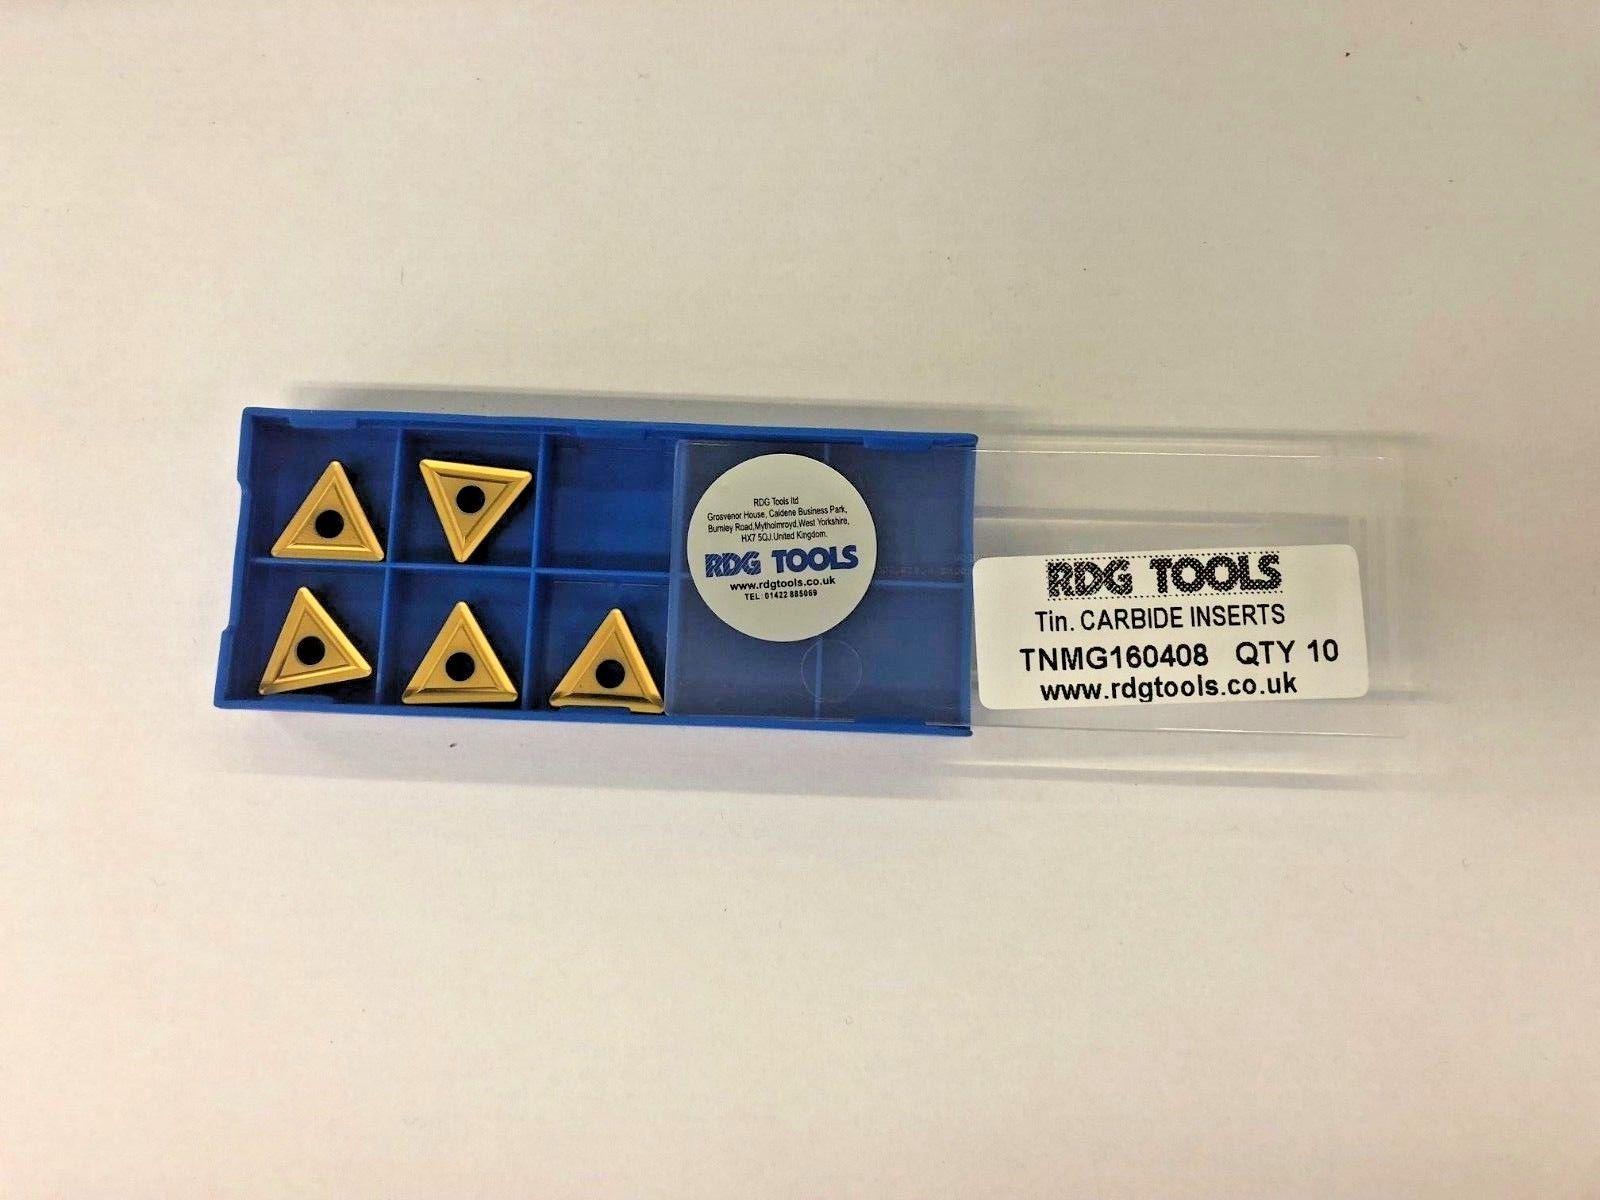 RDGTOOLS TNMA 16 CARBIDE TIPS TURNING TOOLS PROFILE TIPS x5 INSERTS